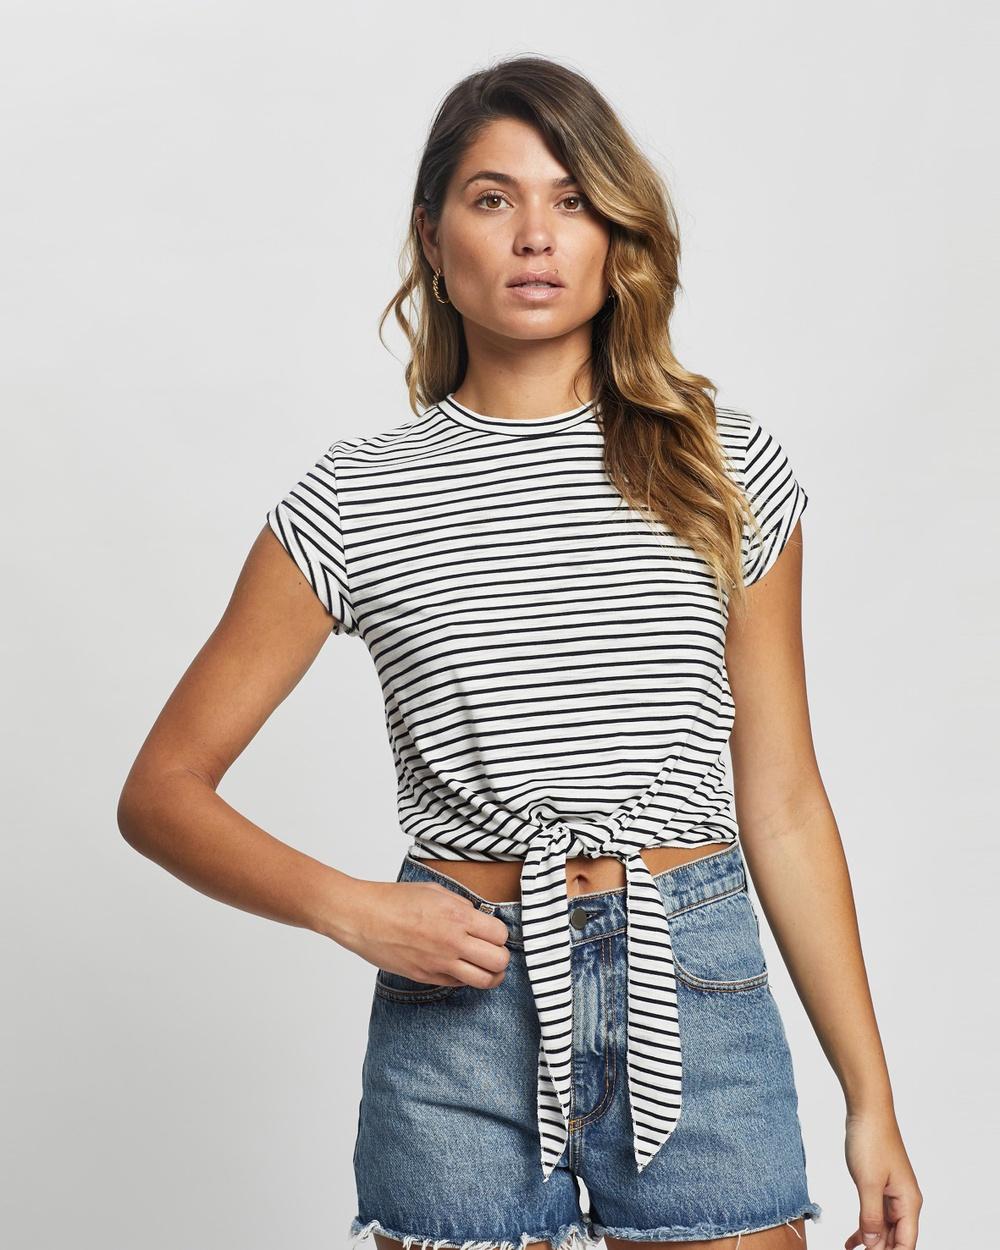 Atmos&Here - Cassie Tie Front Tee - T-Shirts & Singlets (Navy Stripe) Cassie Tie Front Tee